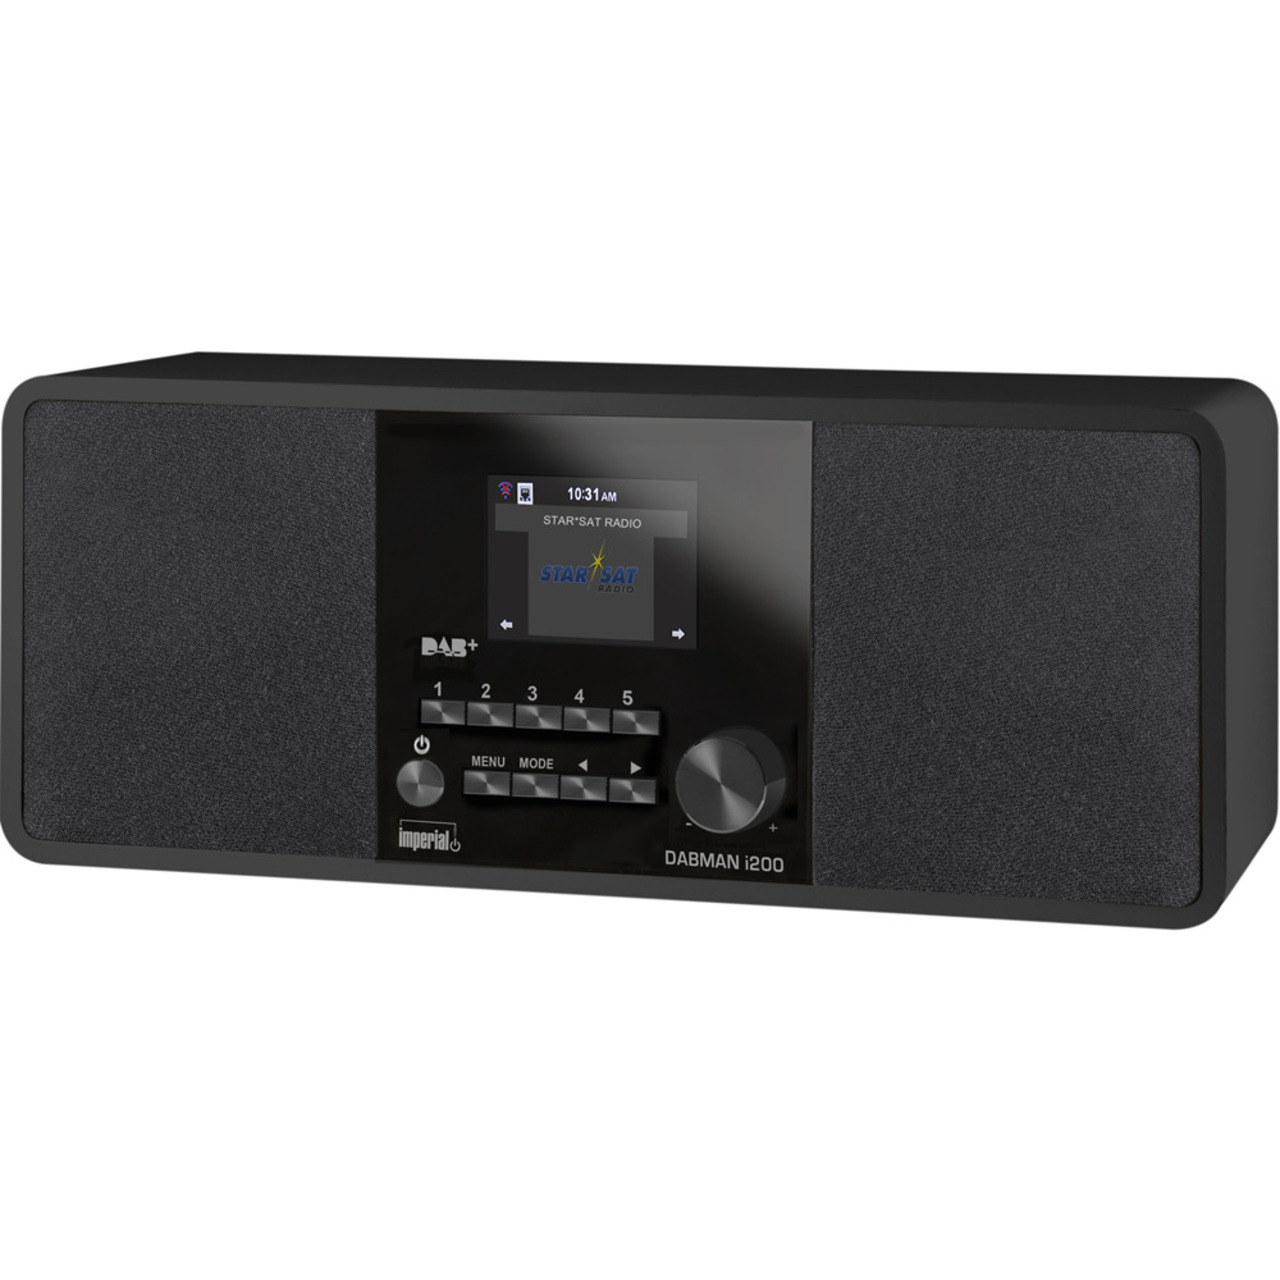 Imperial Digitalradio DABMAN i200- UKW-DAB+-Internetradio- App-Steuerung- schwarz